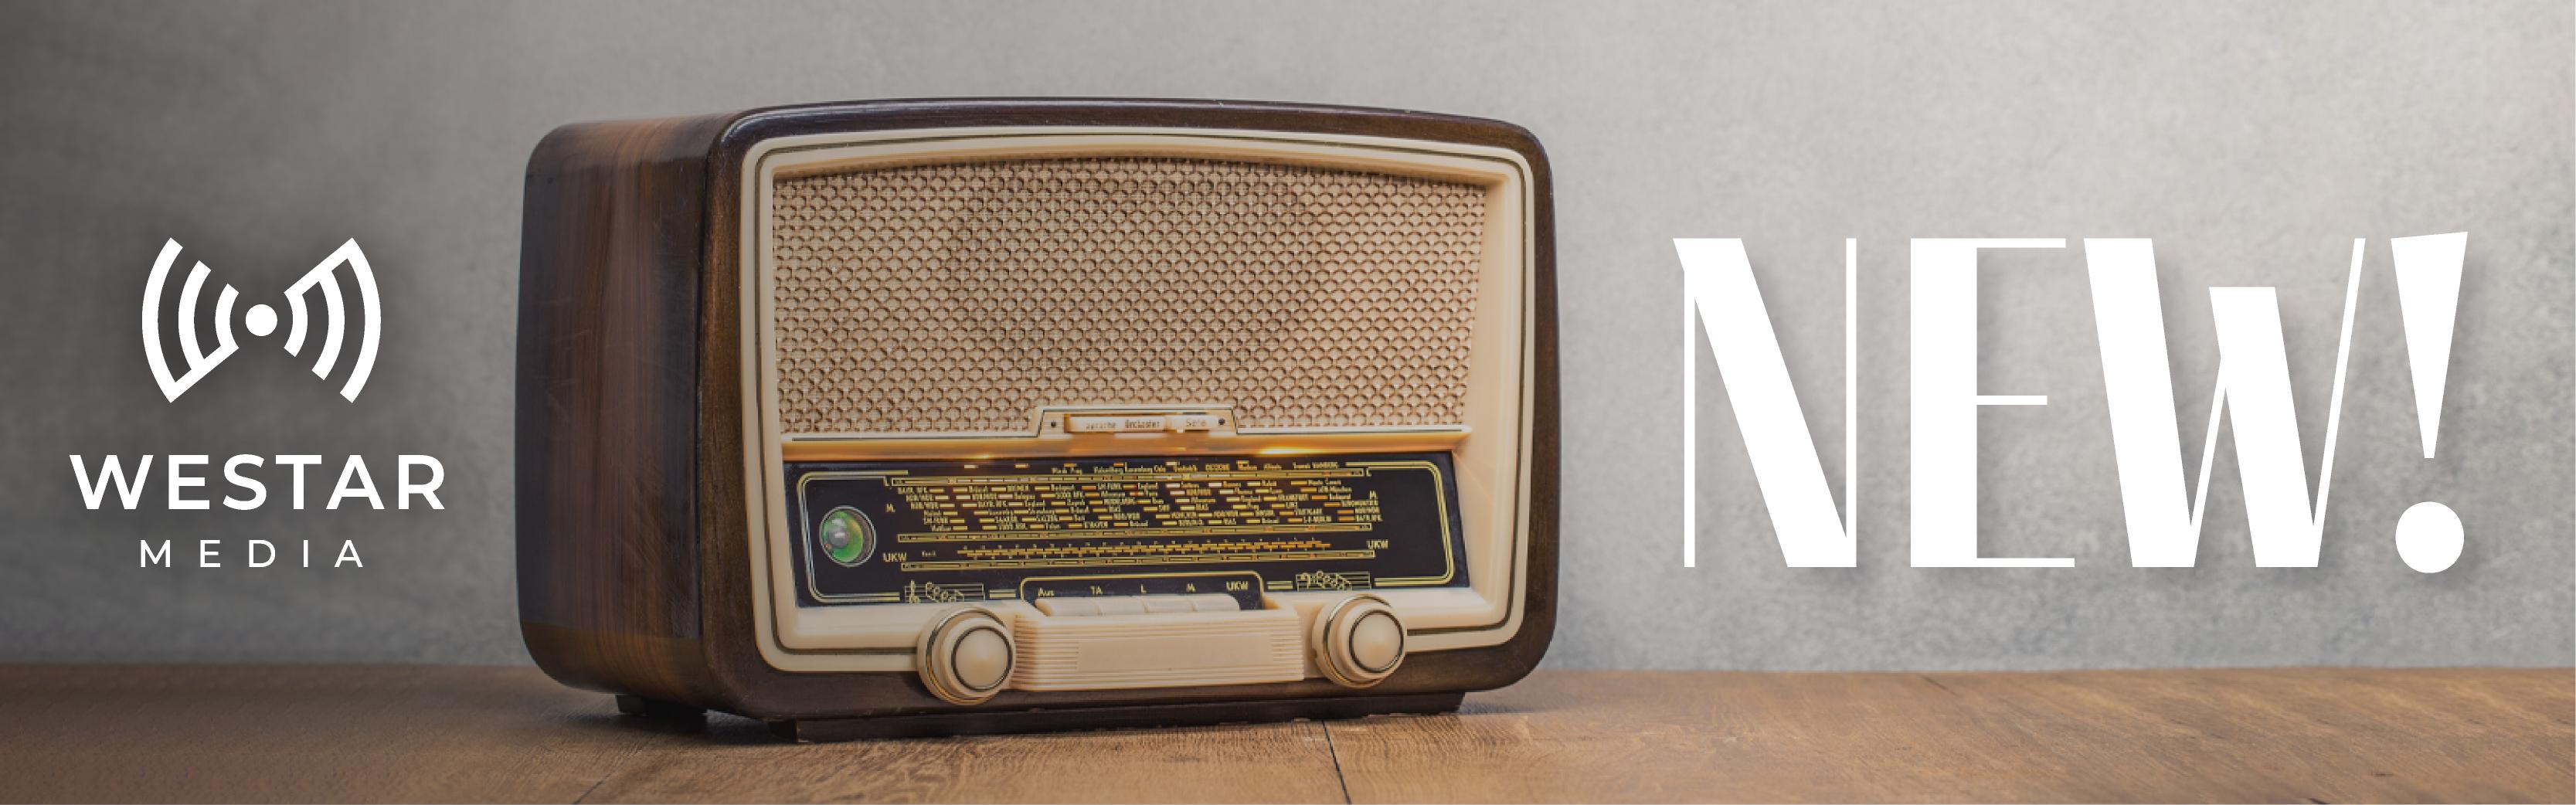 Radio Programs-01-1